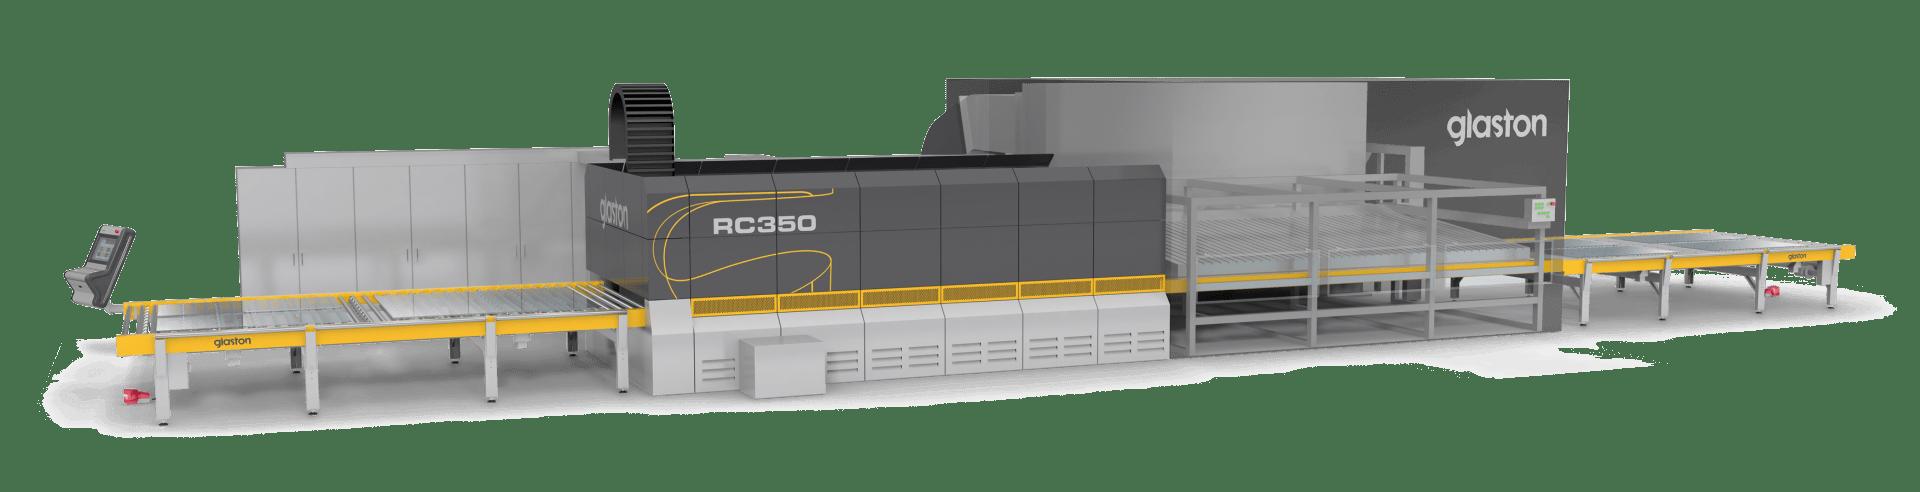 Glaston RC350 tempering furnace